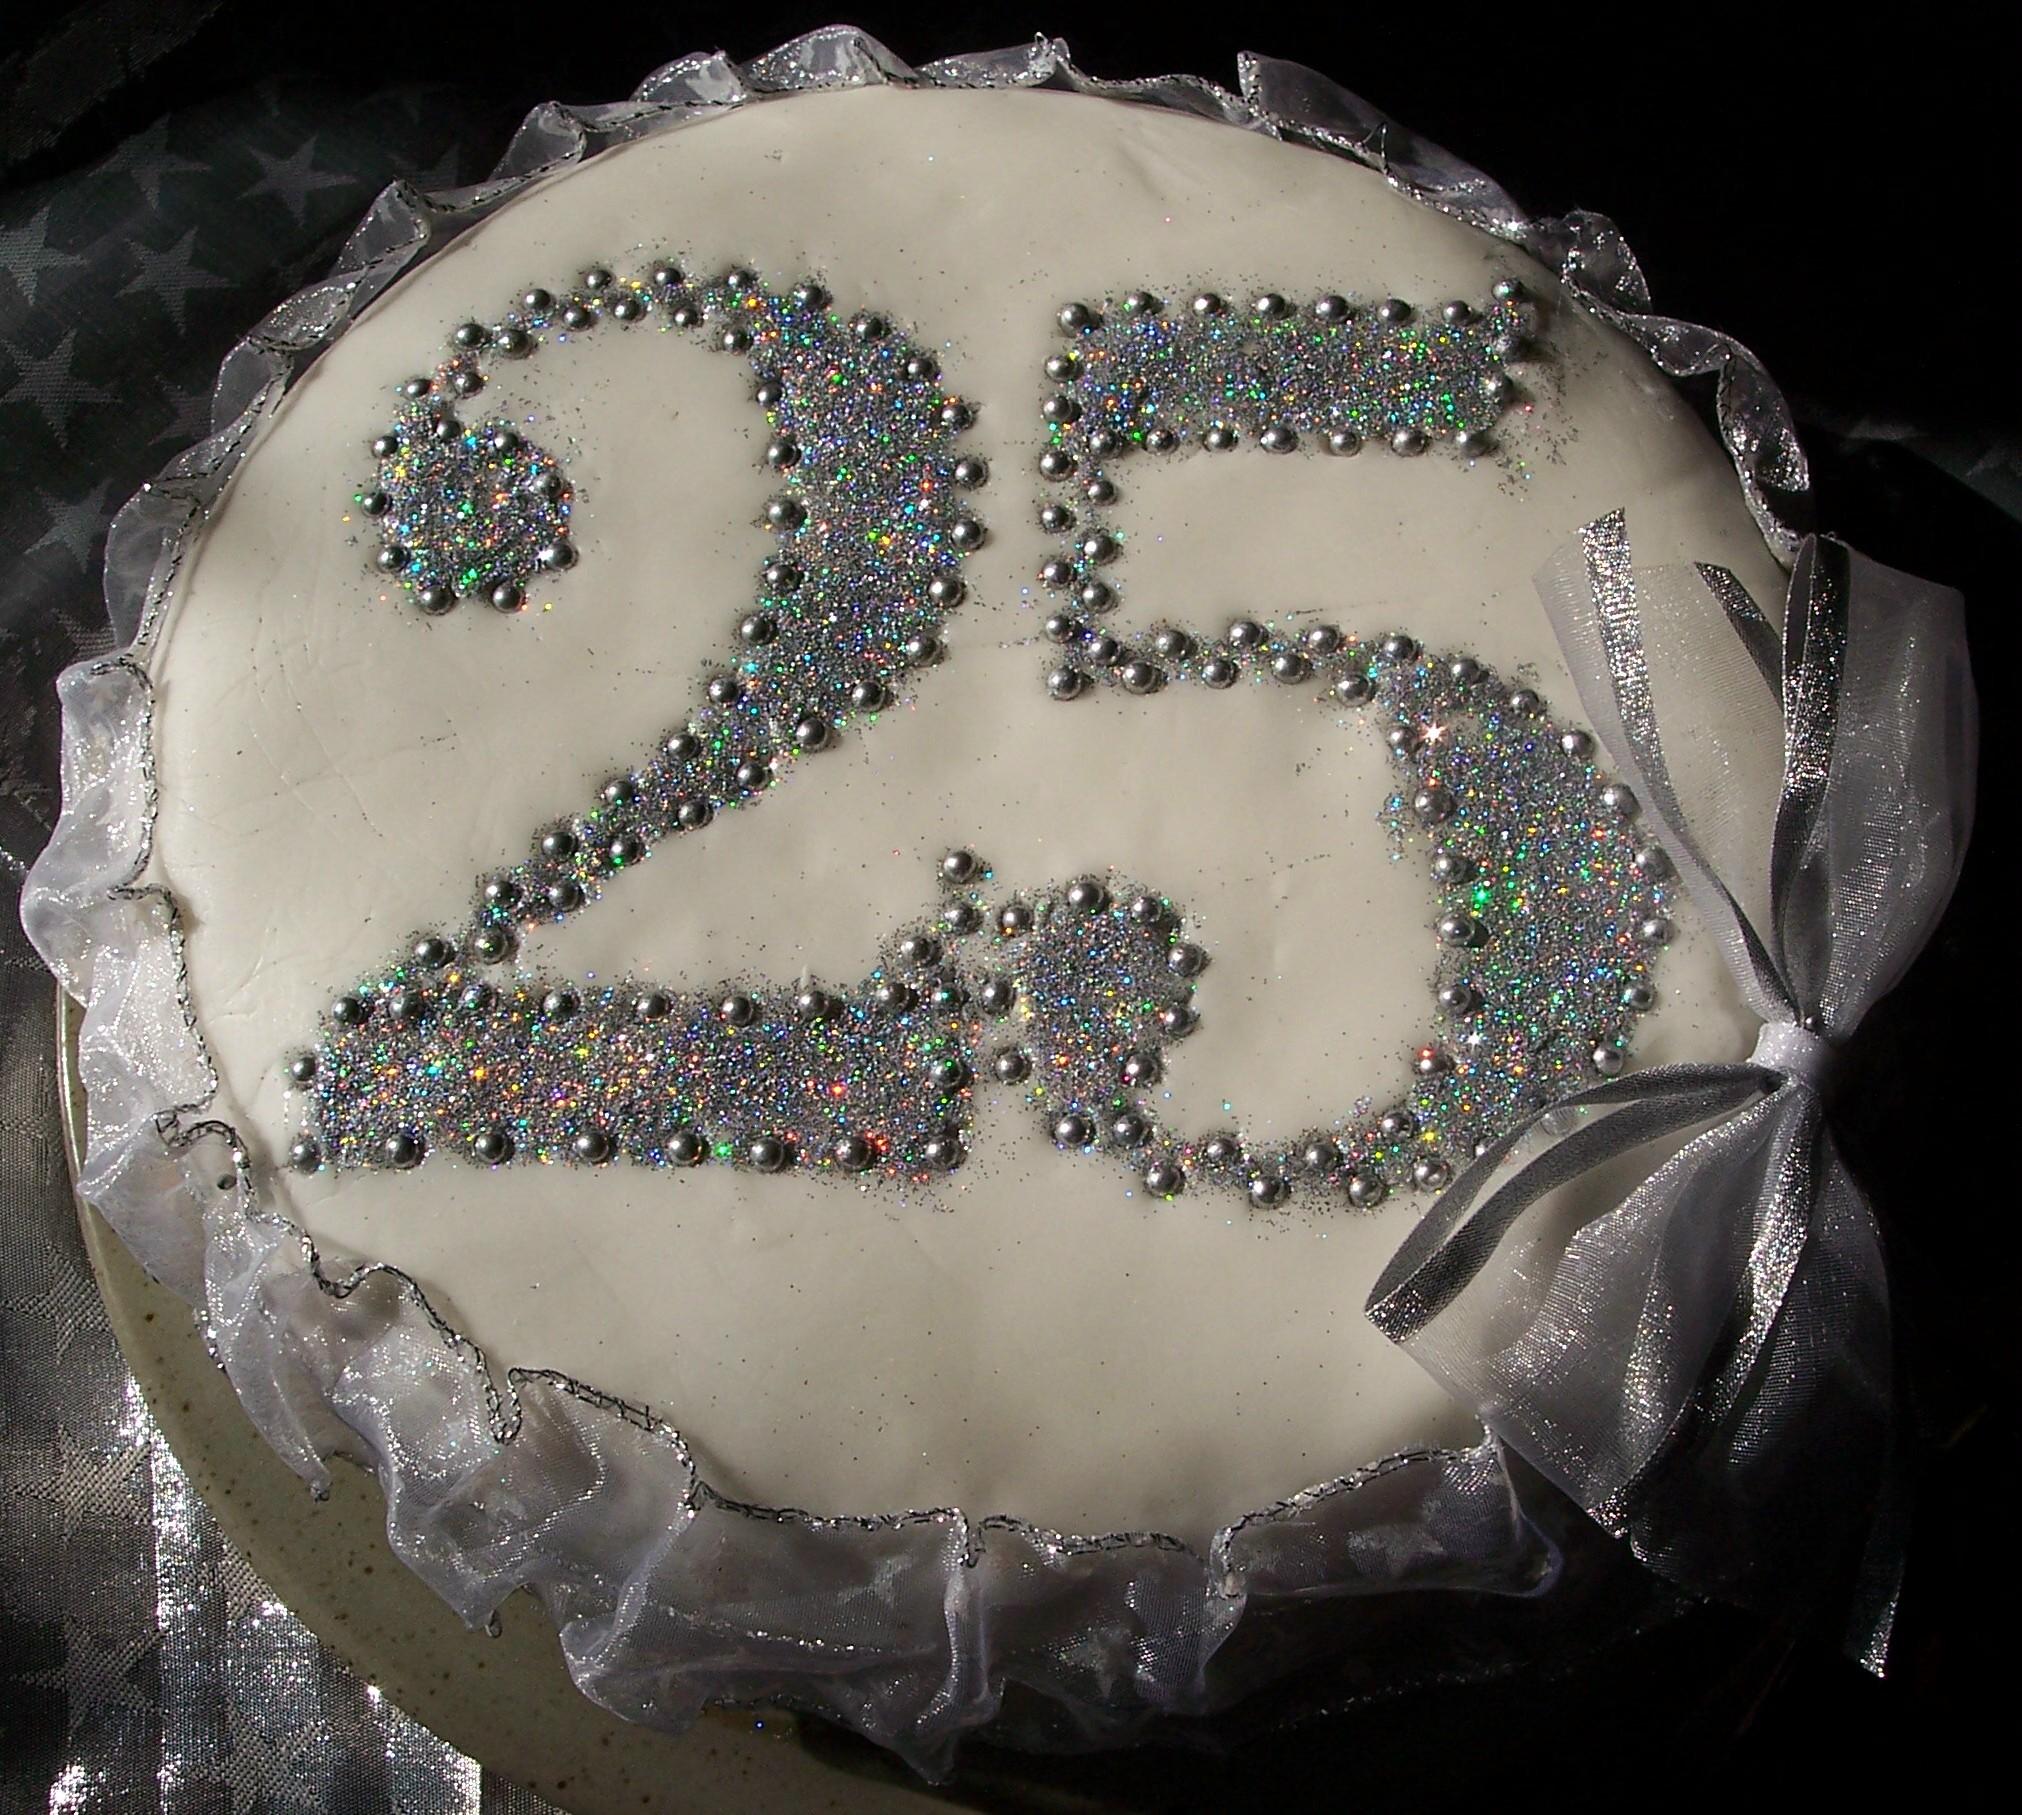 Cake Designs For Silver Jubilee : Nunta de argint   Ghidul tau de nunta by StudioBlitz